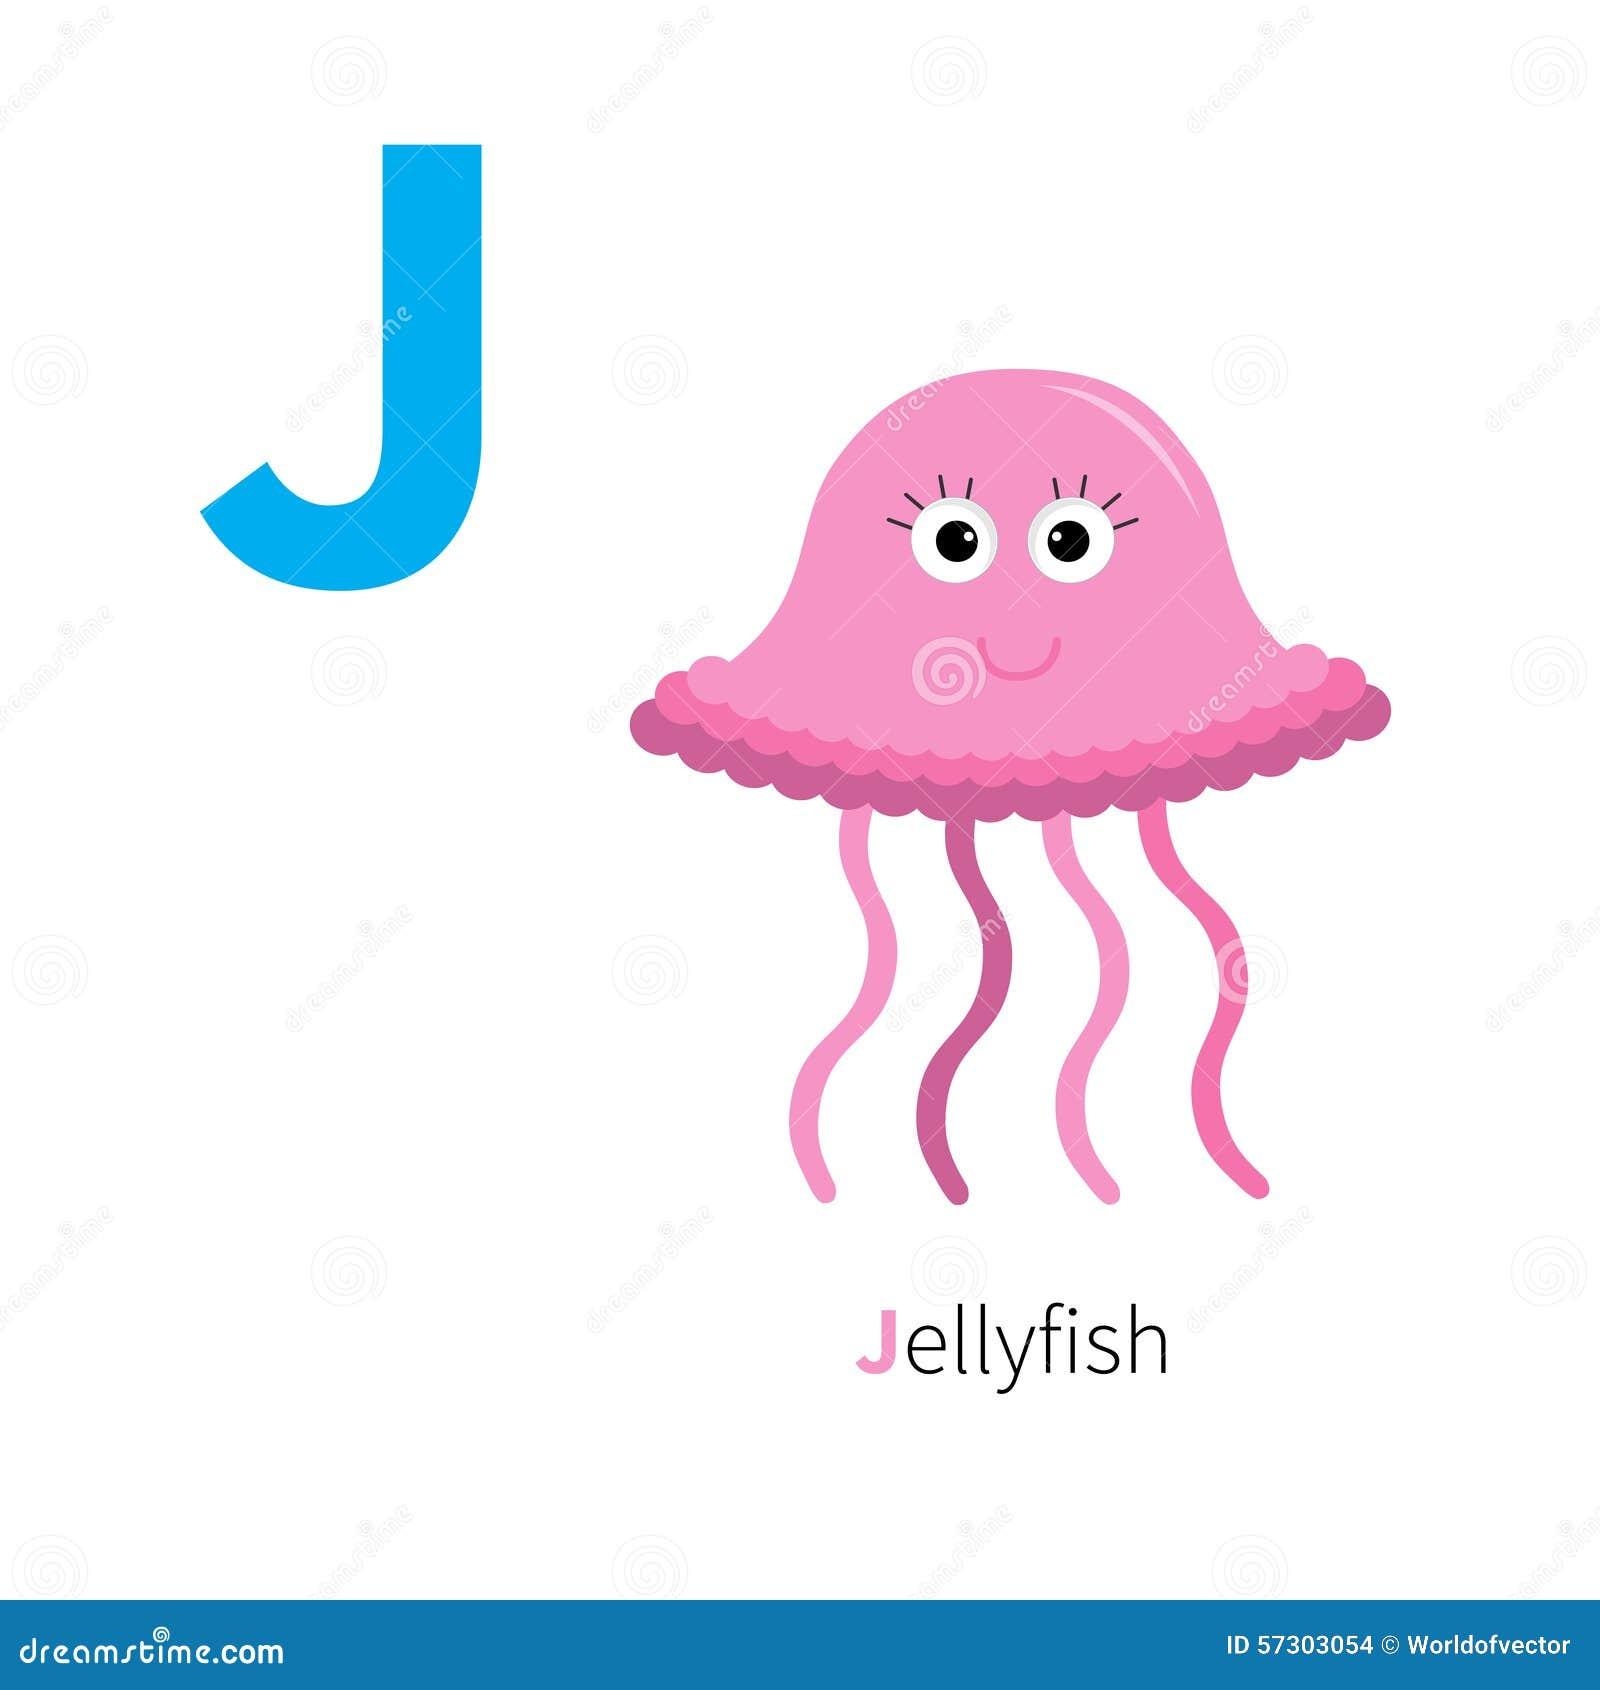 alfabeto del parque zool u00f3gico de las medusas de la letra j jellyfish clip art for kids jellyfish clip art for kids